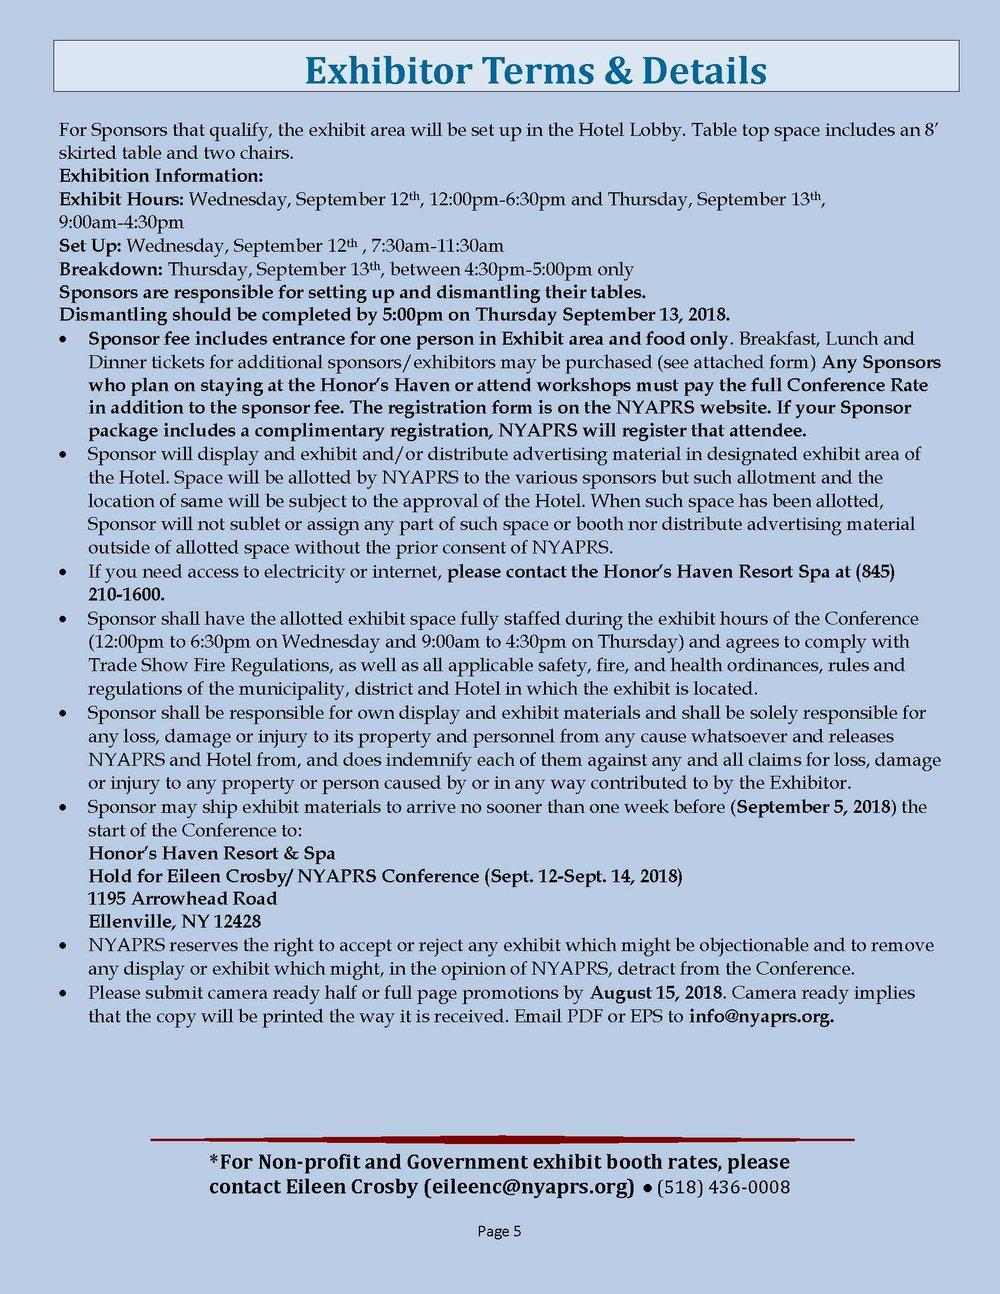 NYAPRS+Sponsor.Exhibitor+Packet+2018_Page_5.jpg